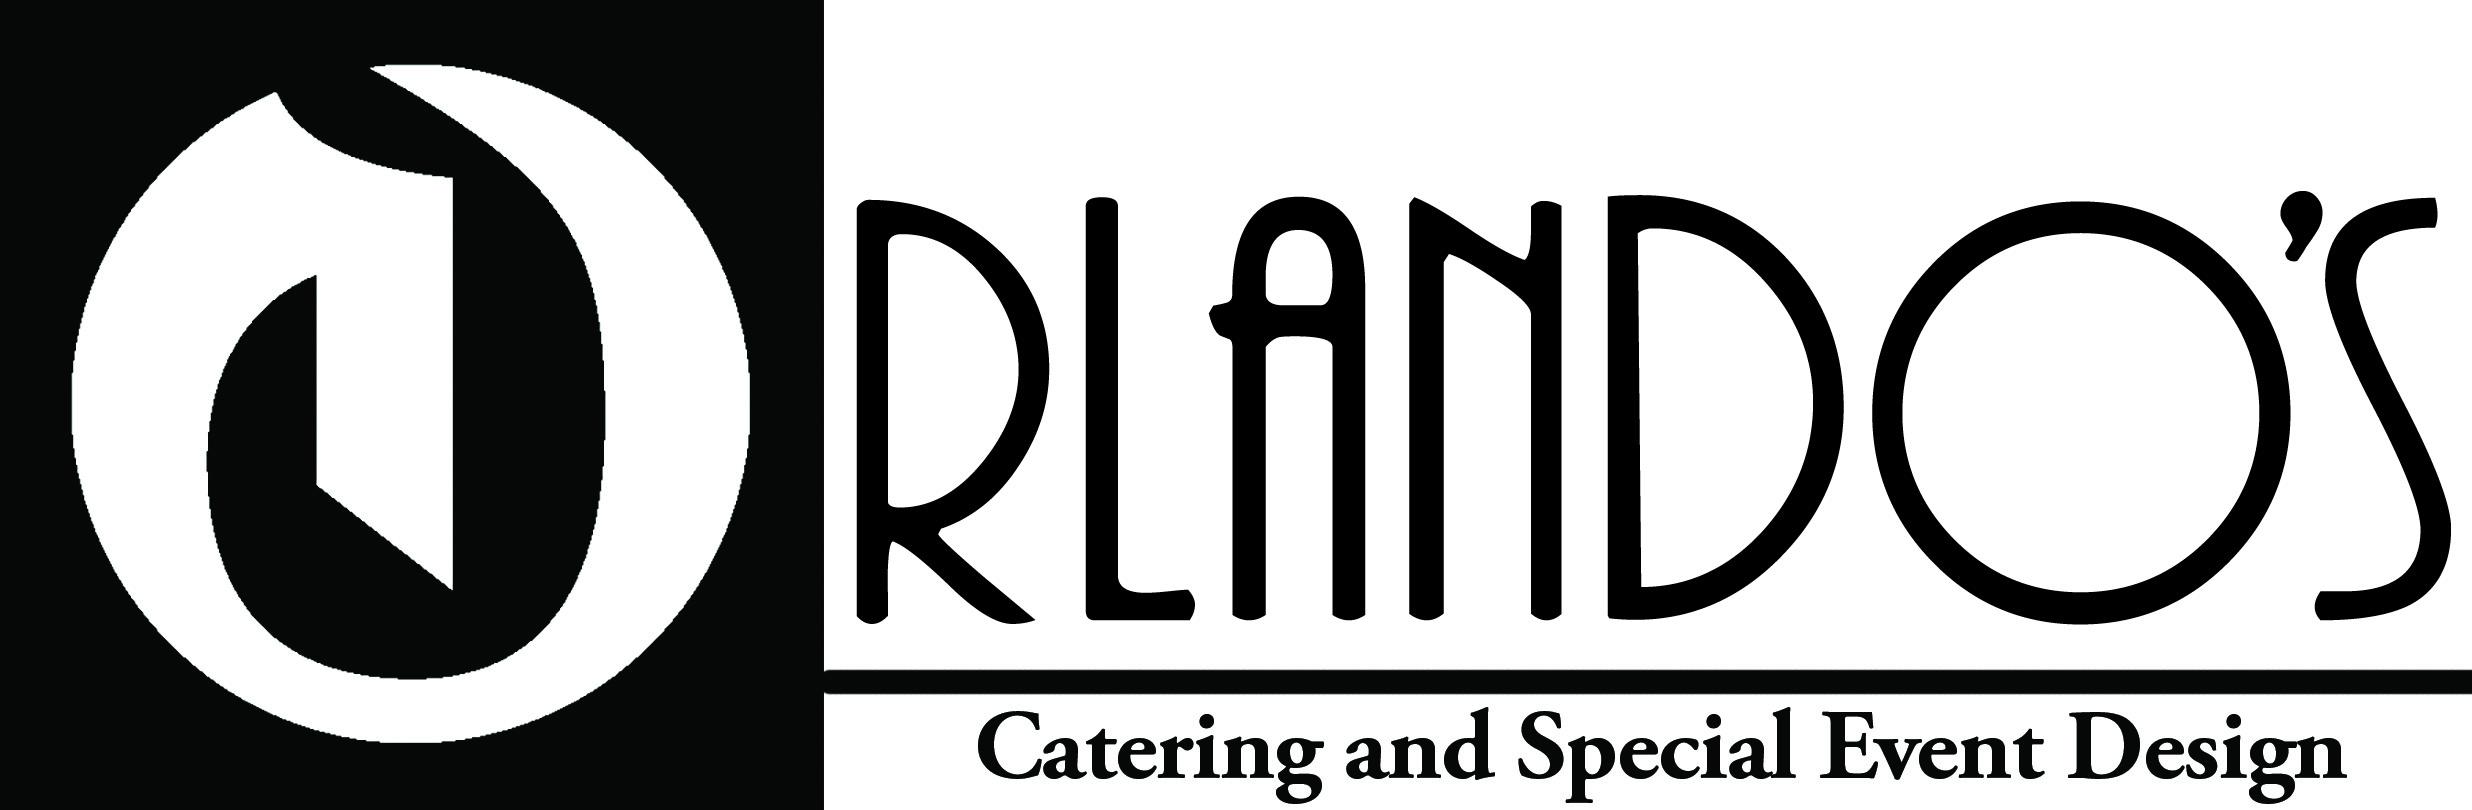 orlando's logo 3.jpg